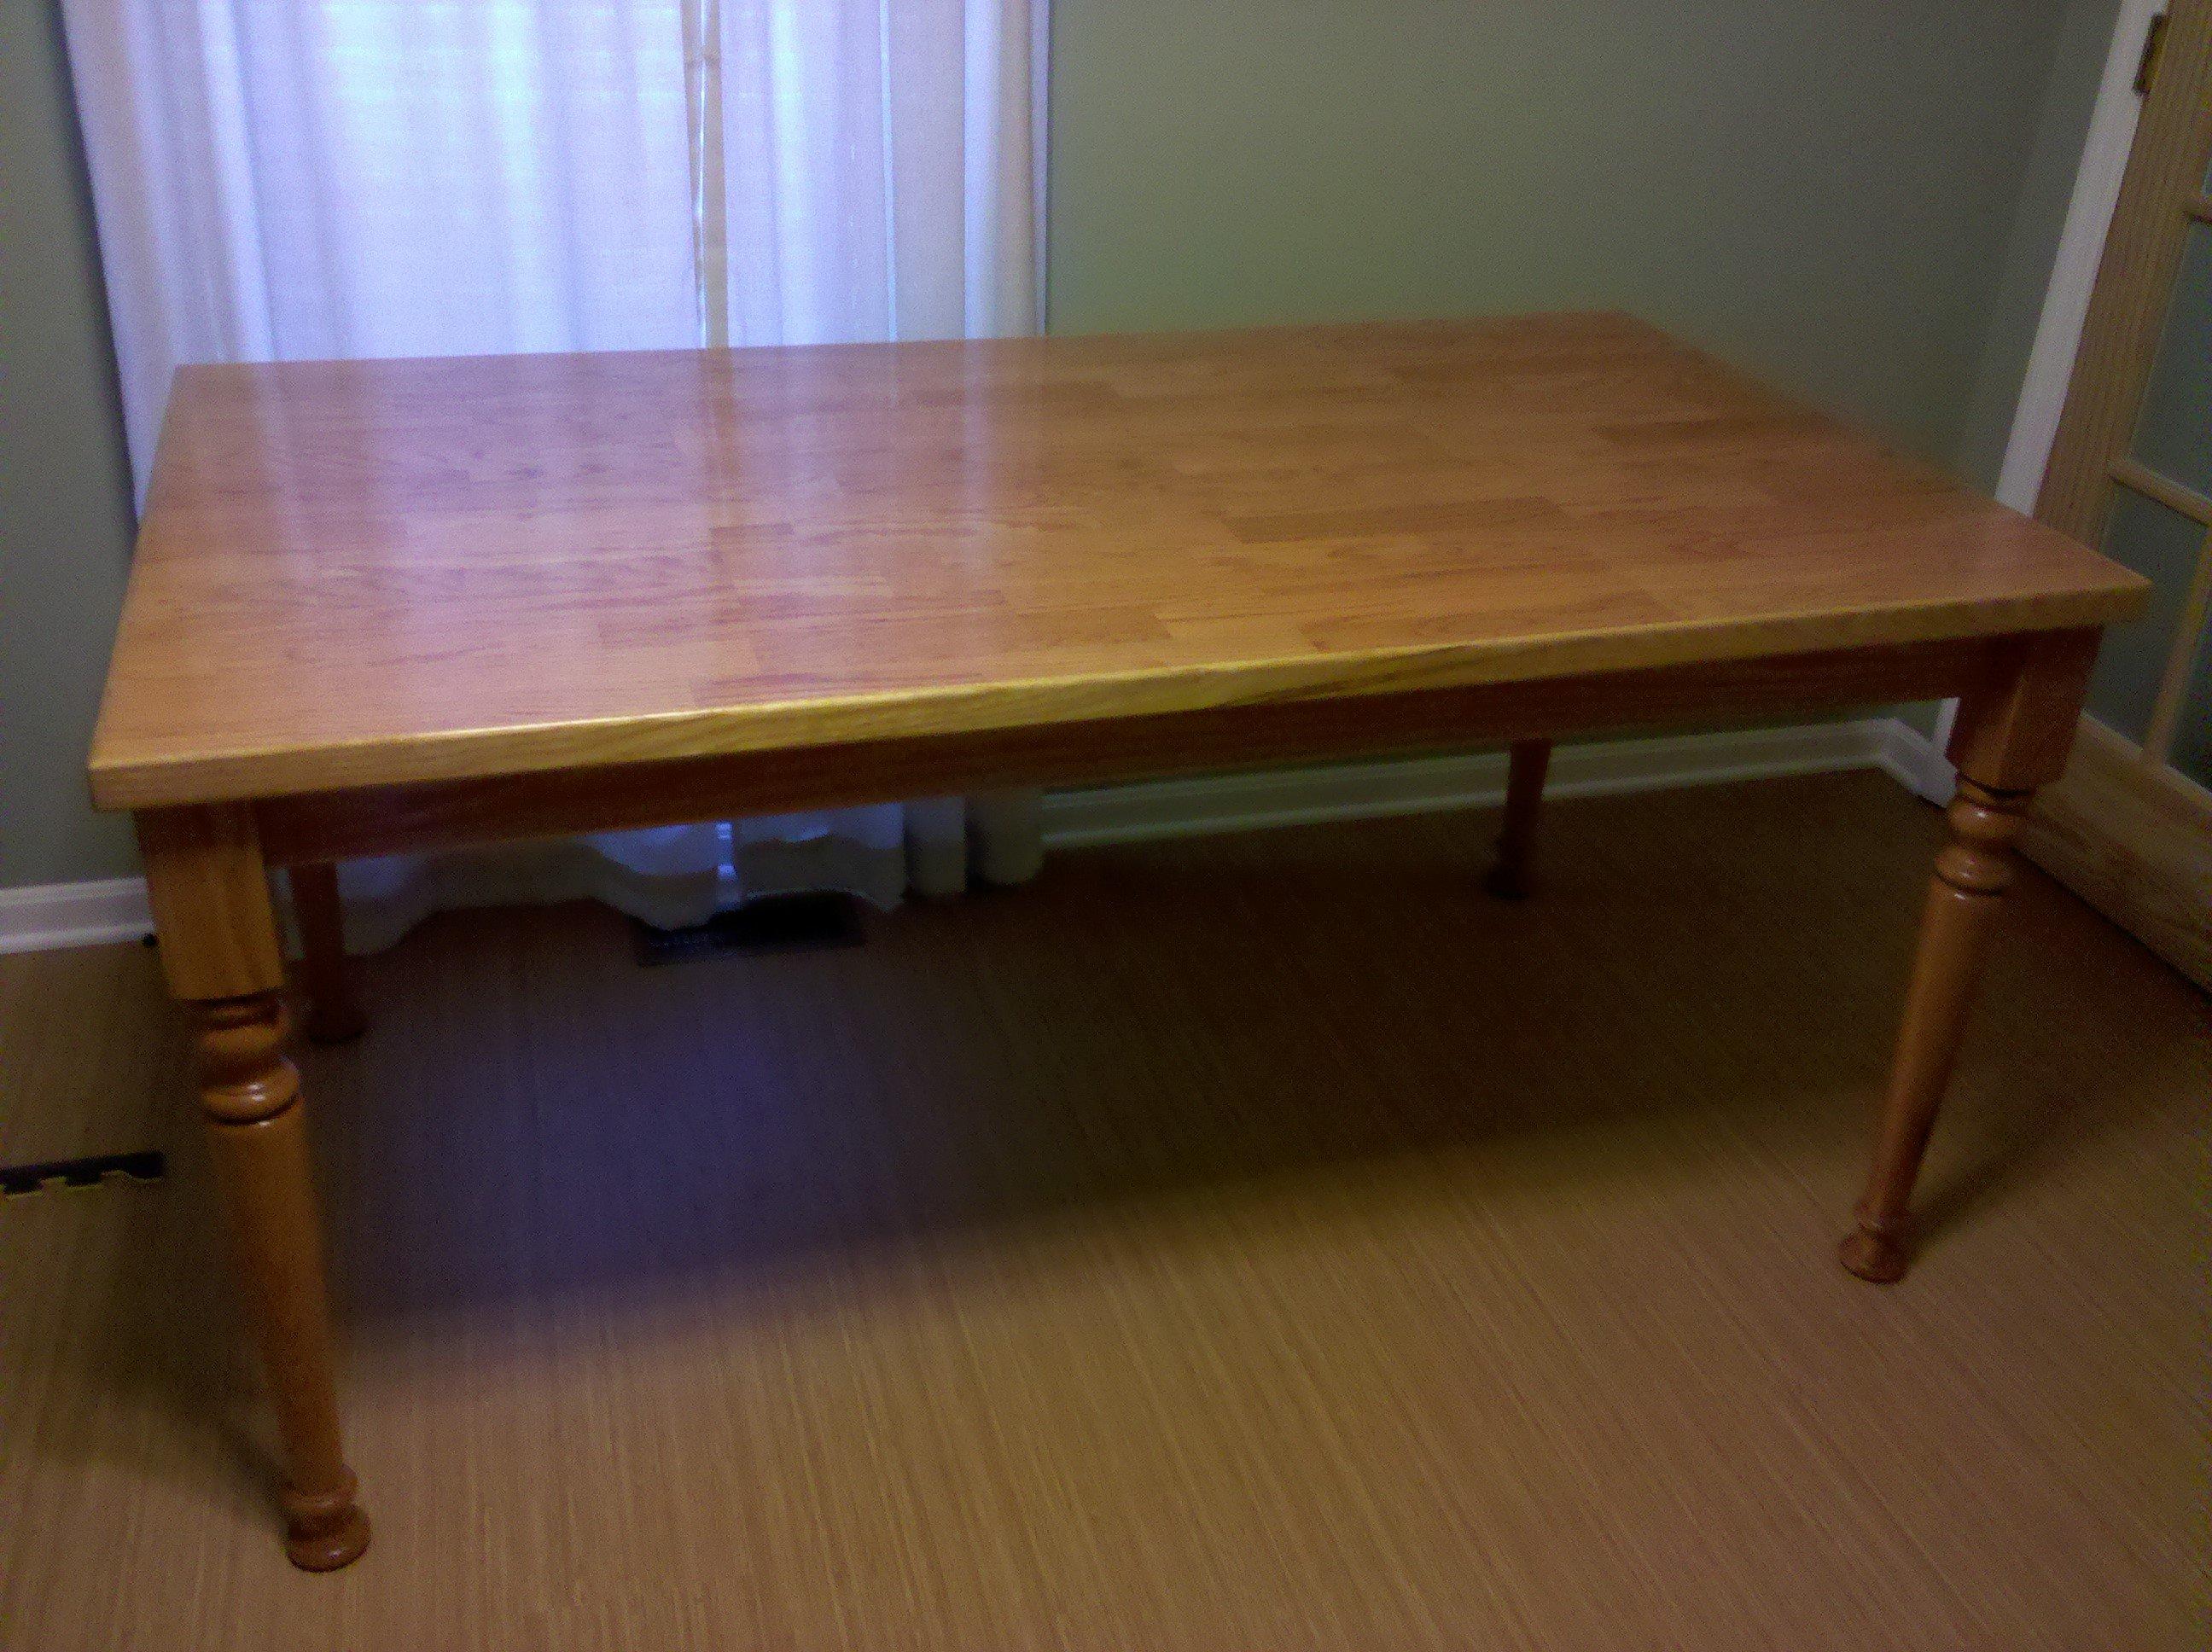 http://diyexploits.com/wp-content/uploads/2013/07/Dining-room-table.jpg